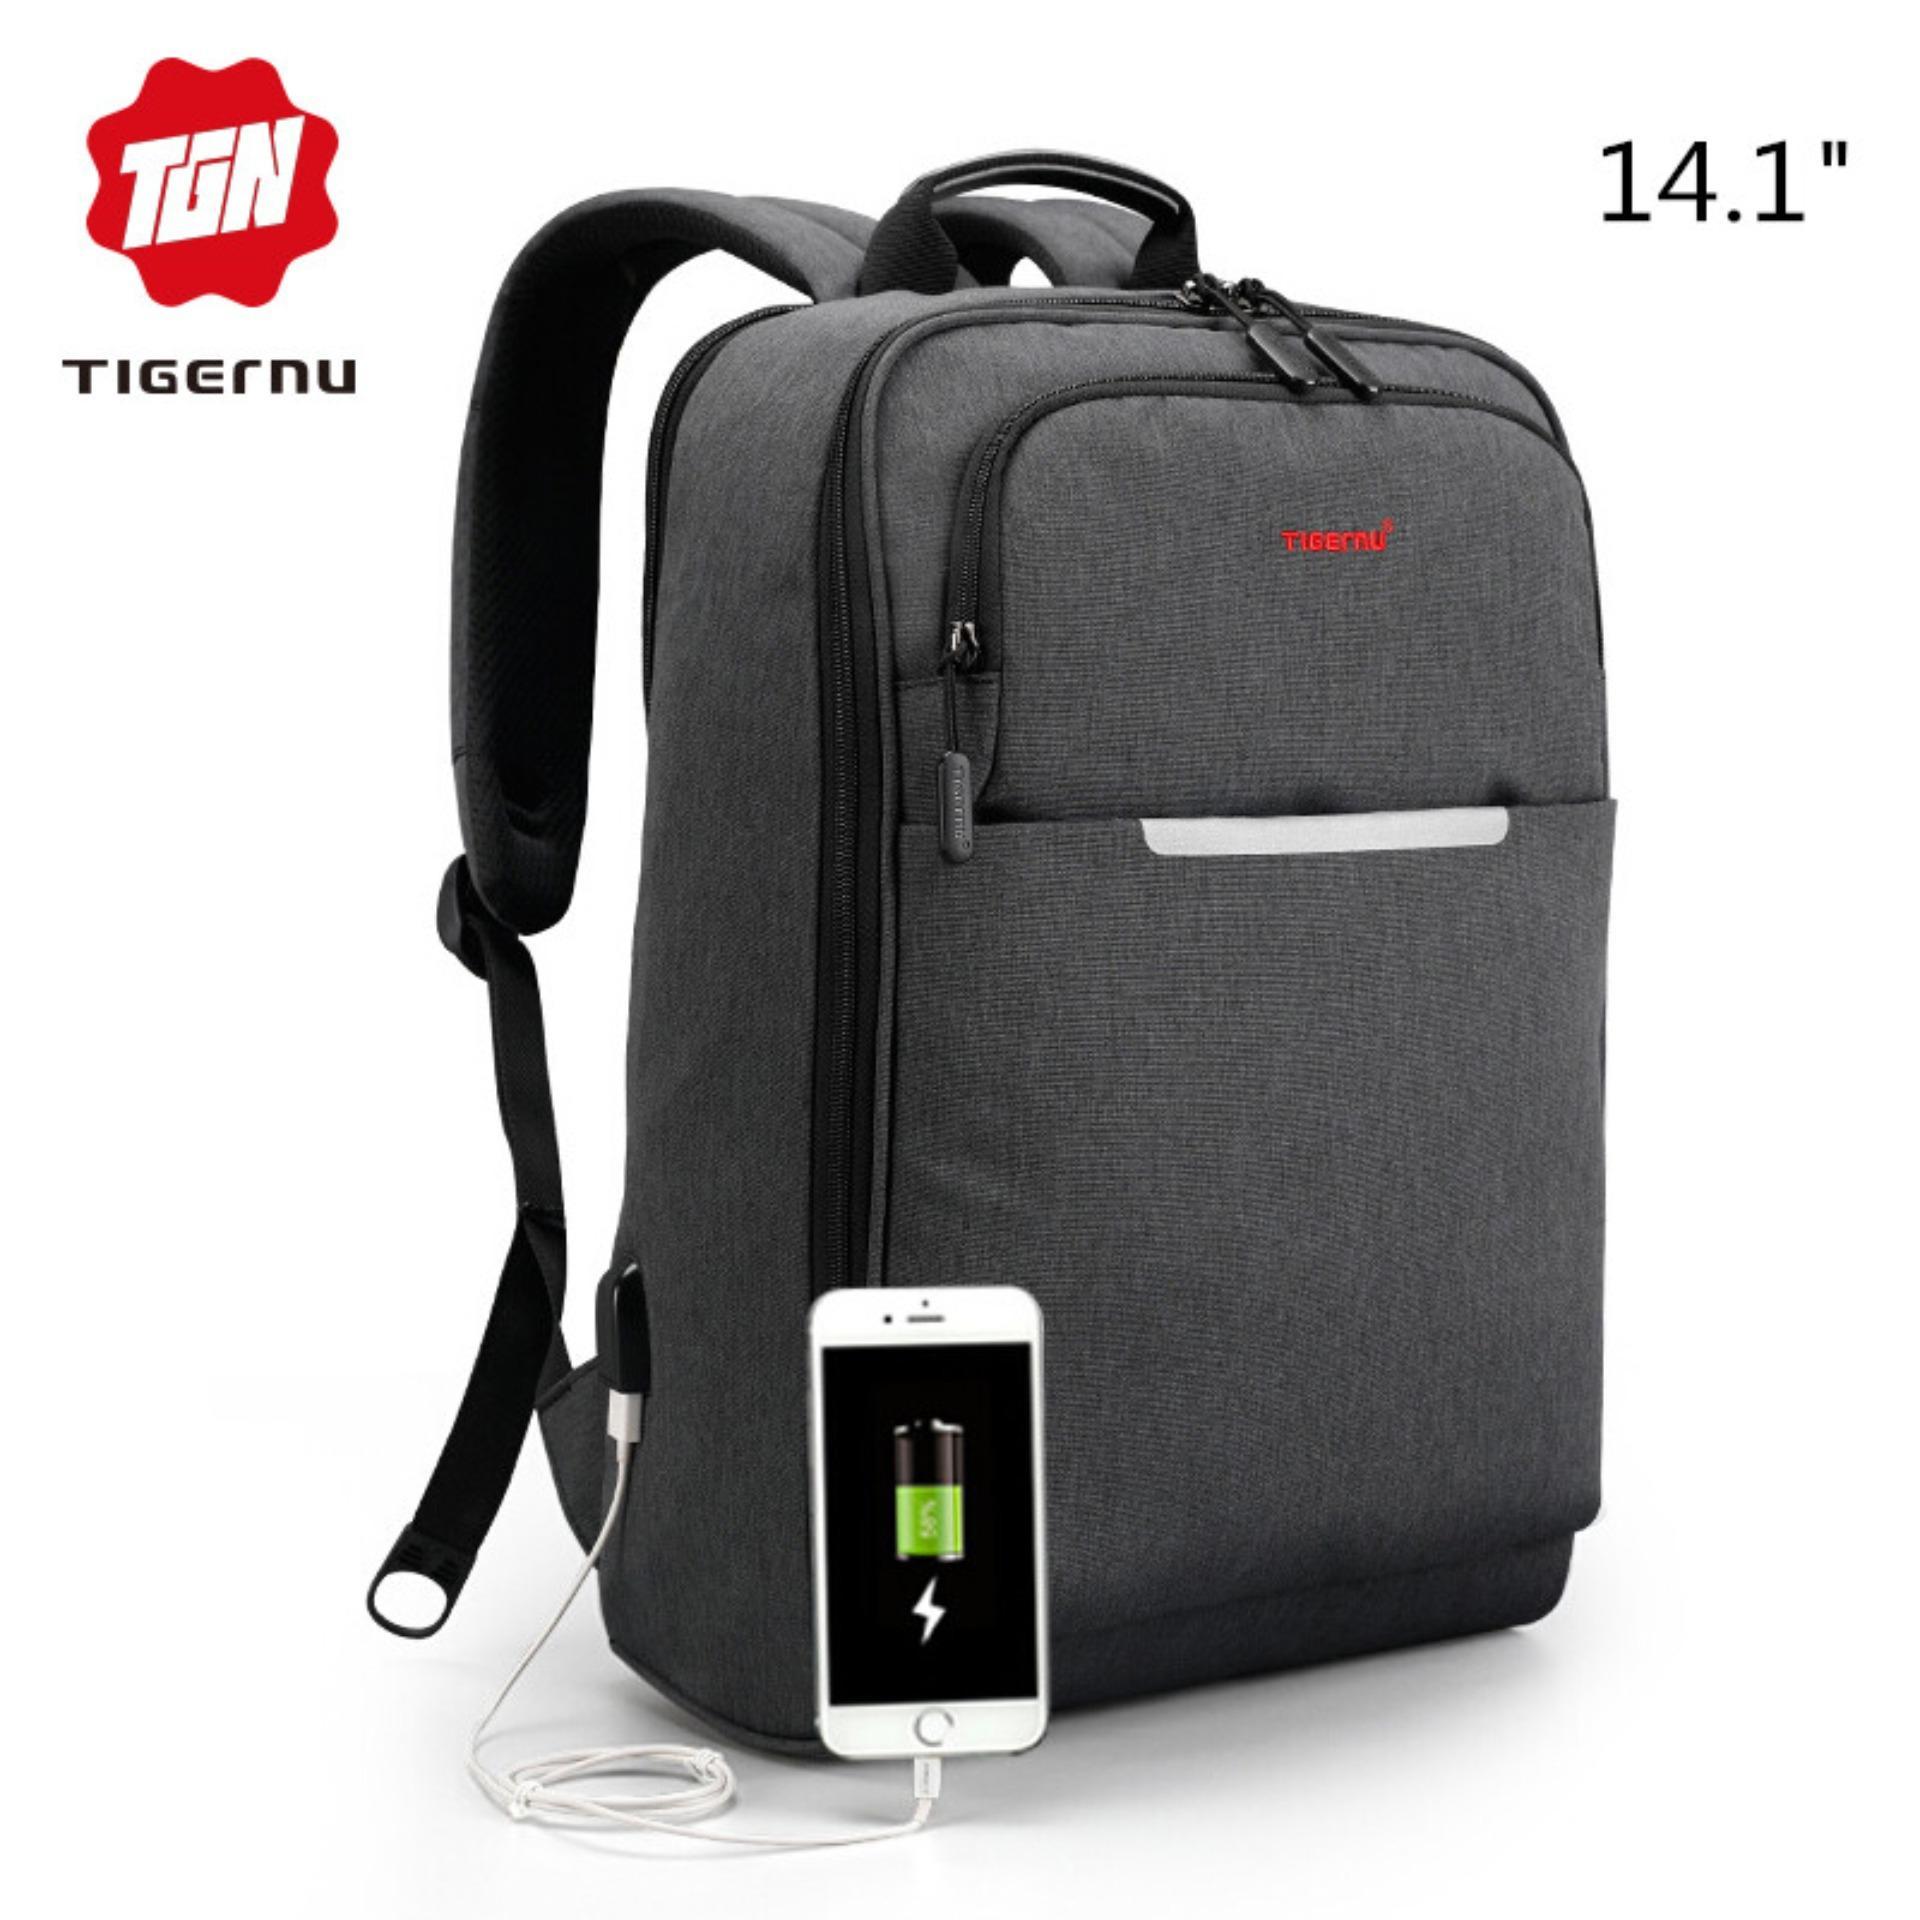 Tigernu Baru USB Pengisian Laptop Ransel Cocok untuk 12-14 Inch Laptop 3305-Intl